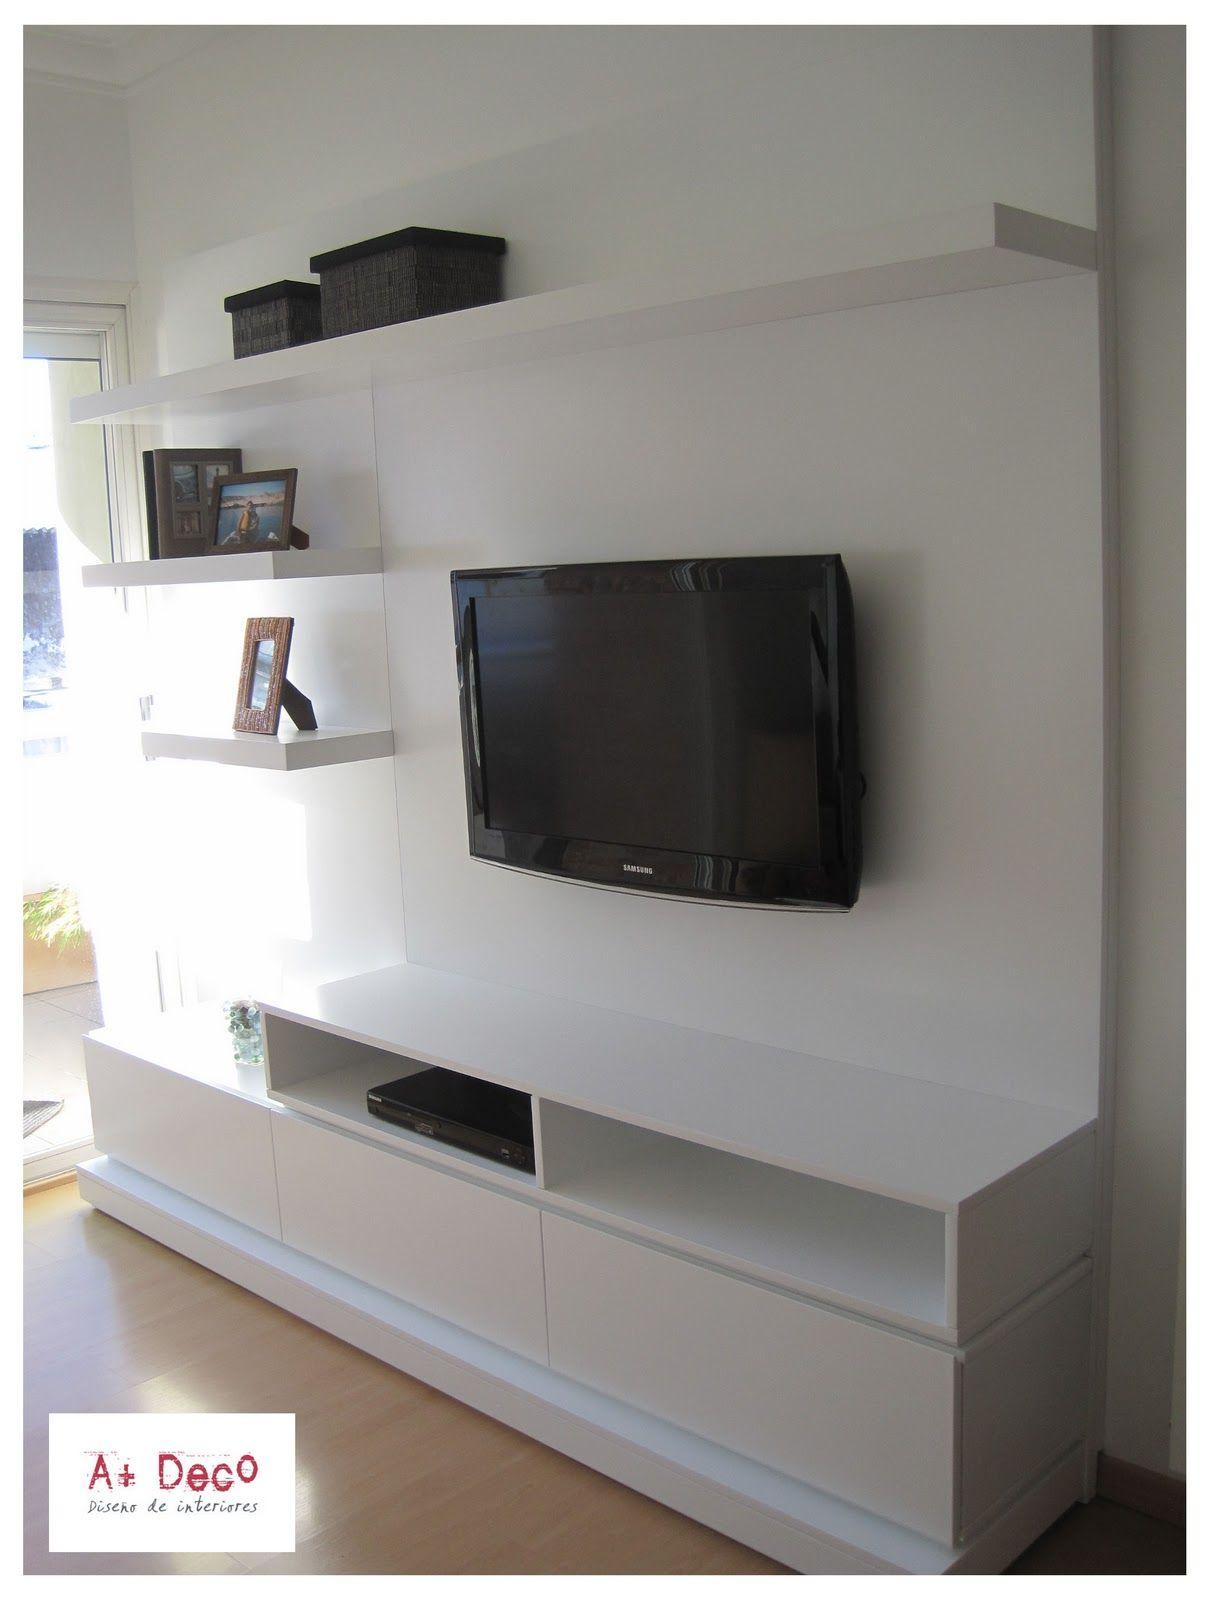 Pintar puertas placa blanca buscar con google home for Pintar puertas de blanco en casa